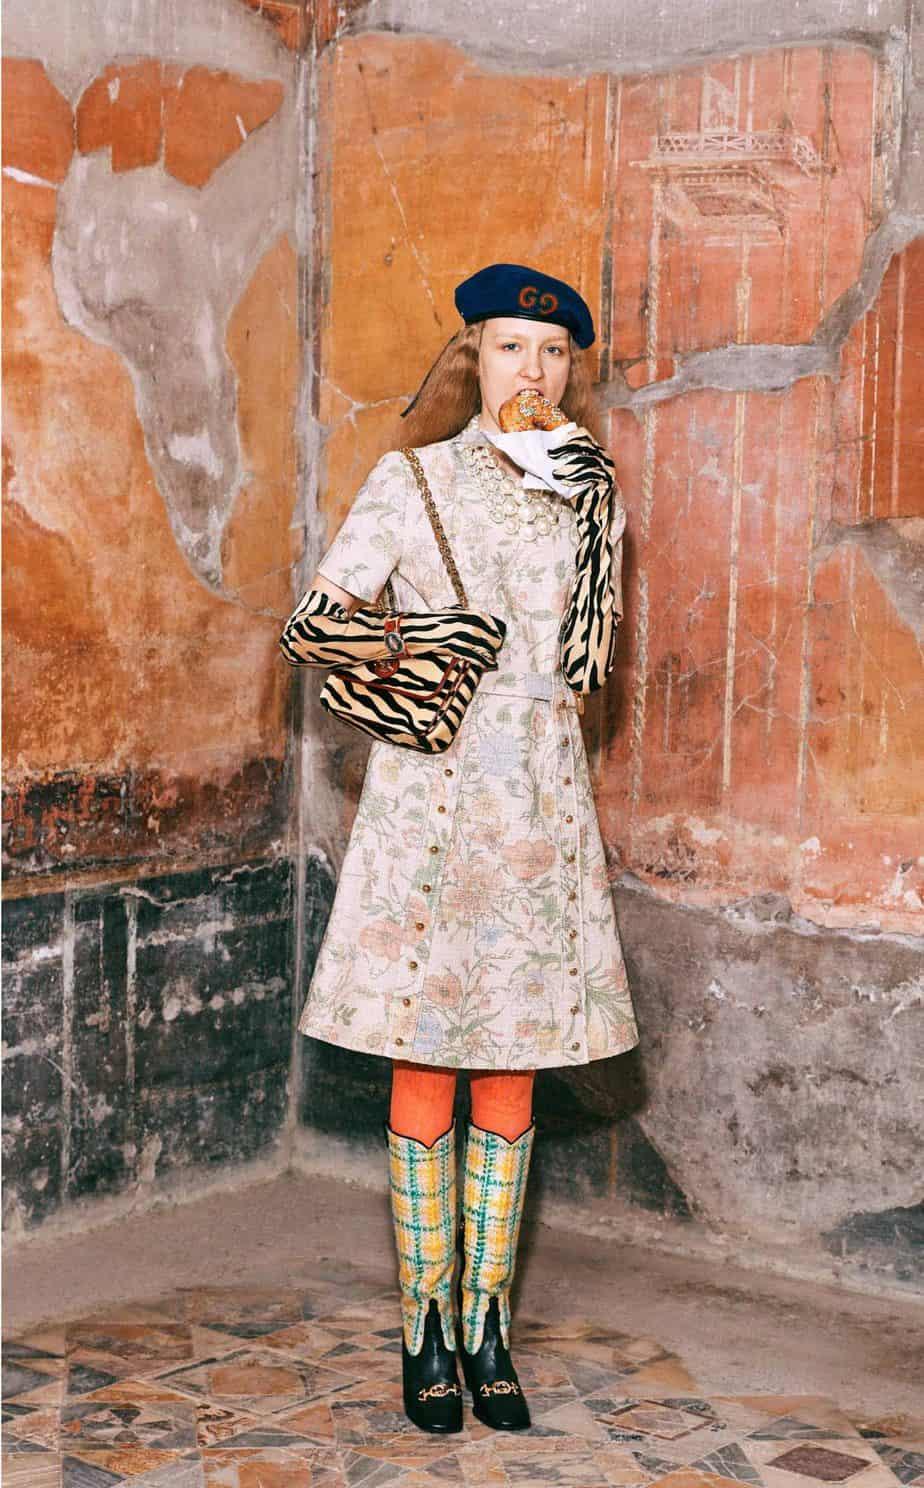 GUCCI, FALL 2019. WOMEN'S FASHION, Photographer Harmony Korine, Art Director, Christopher Simmonds - 26